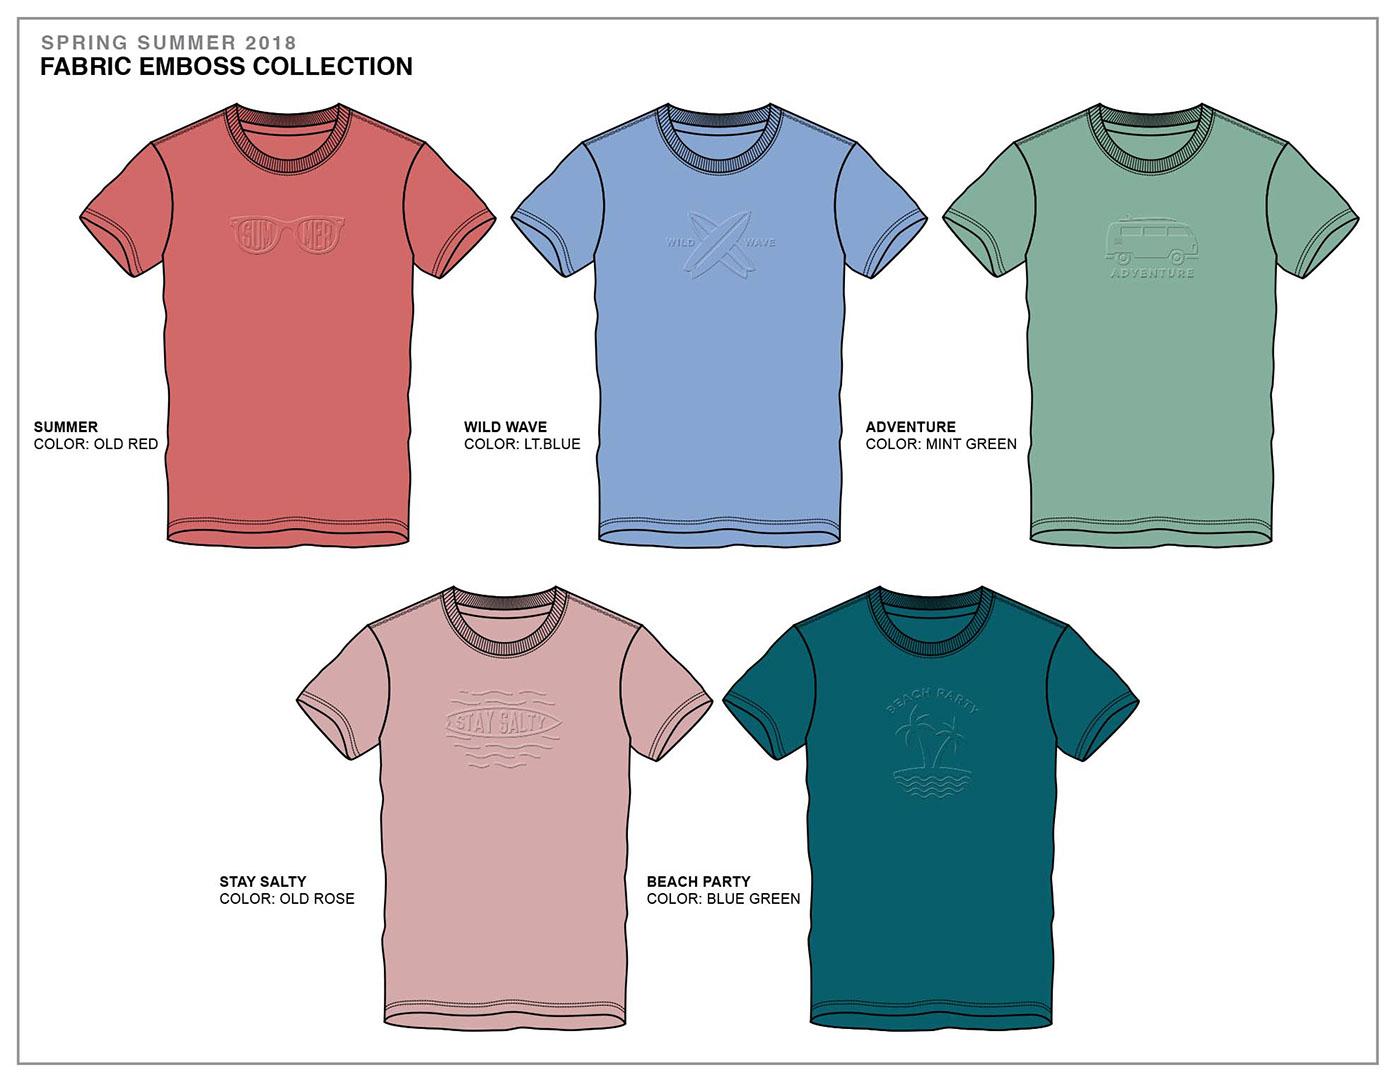 apparel fabric emboss summer 2018